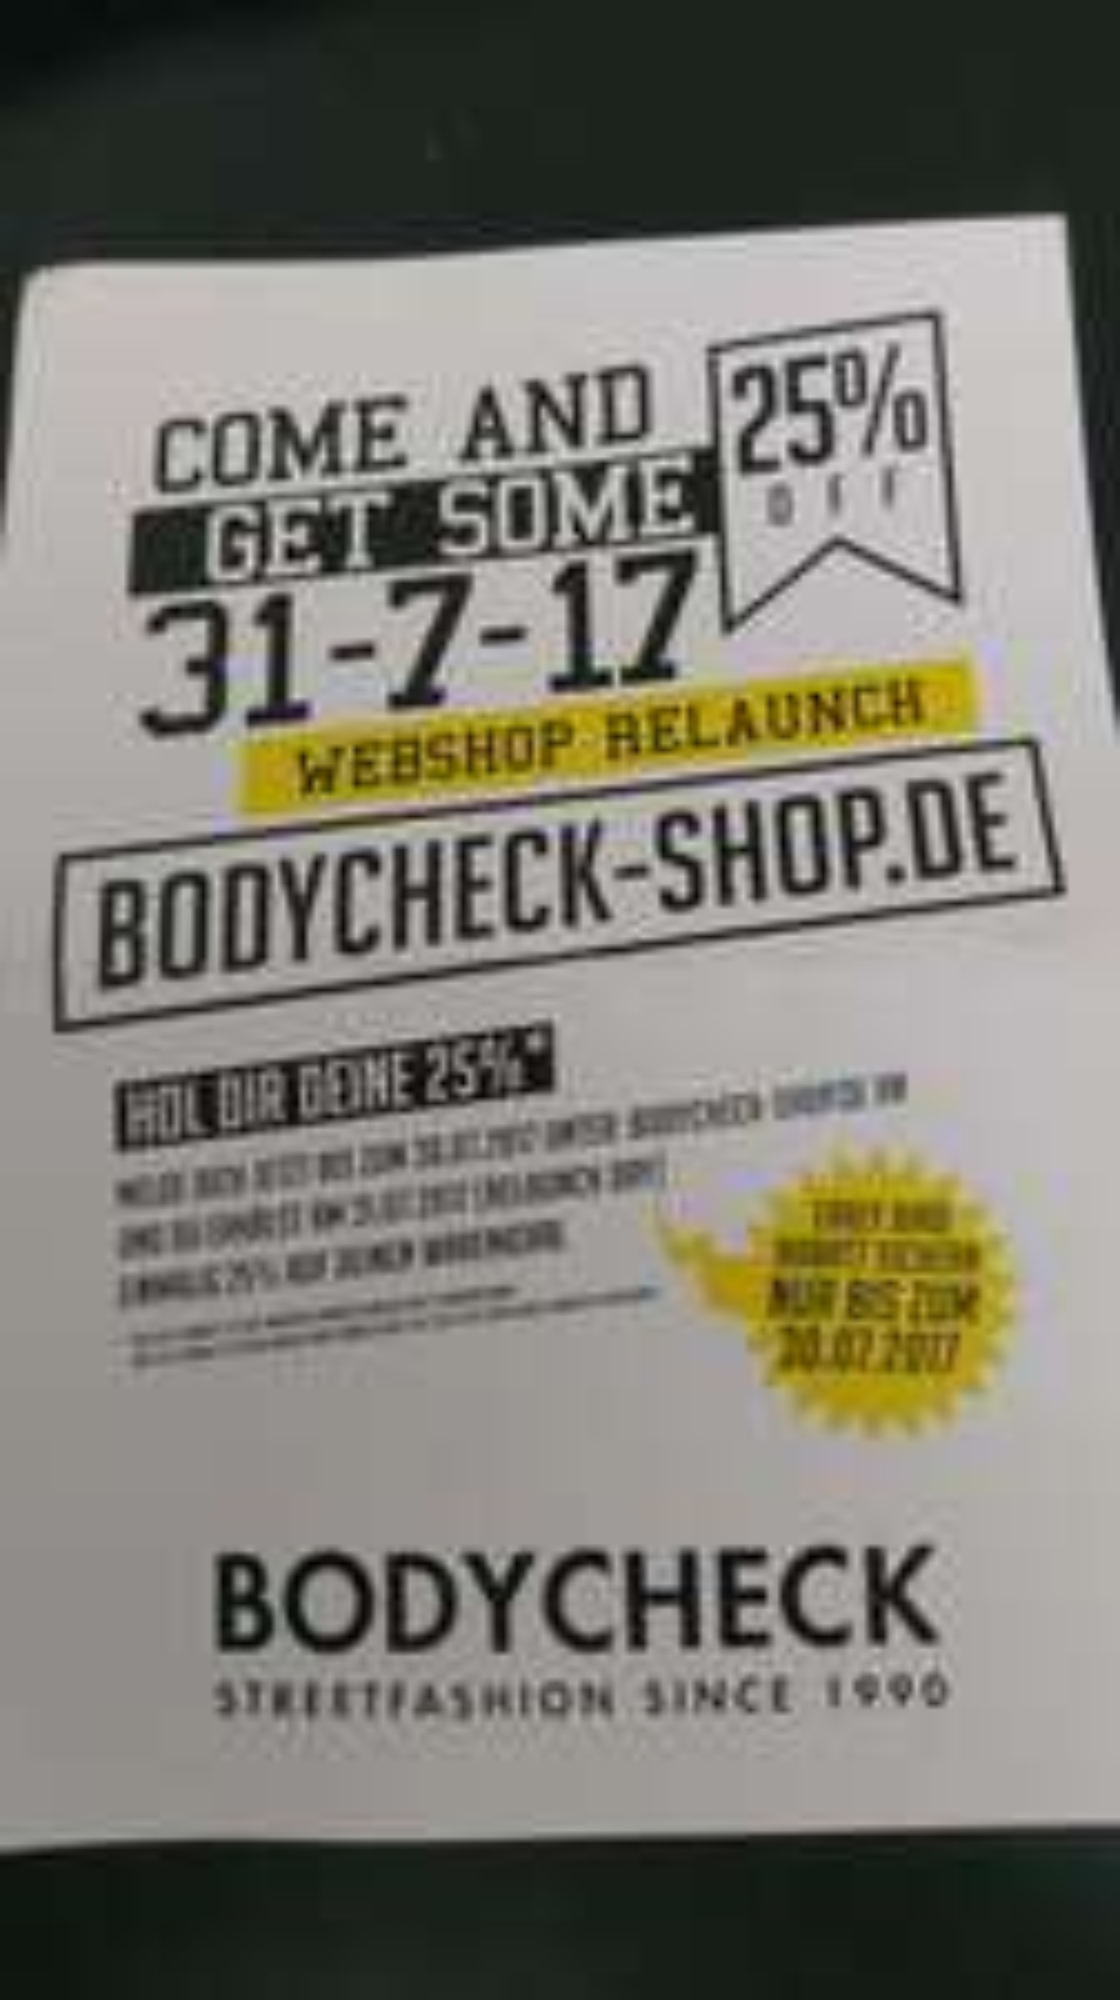 25% Rabatt im neuen Bodycheck Shop